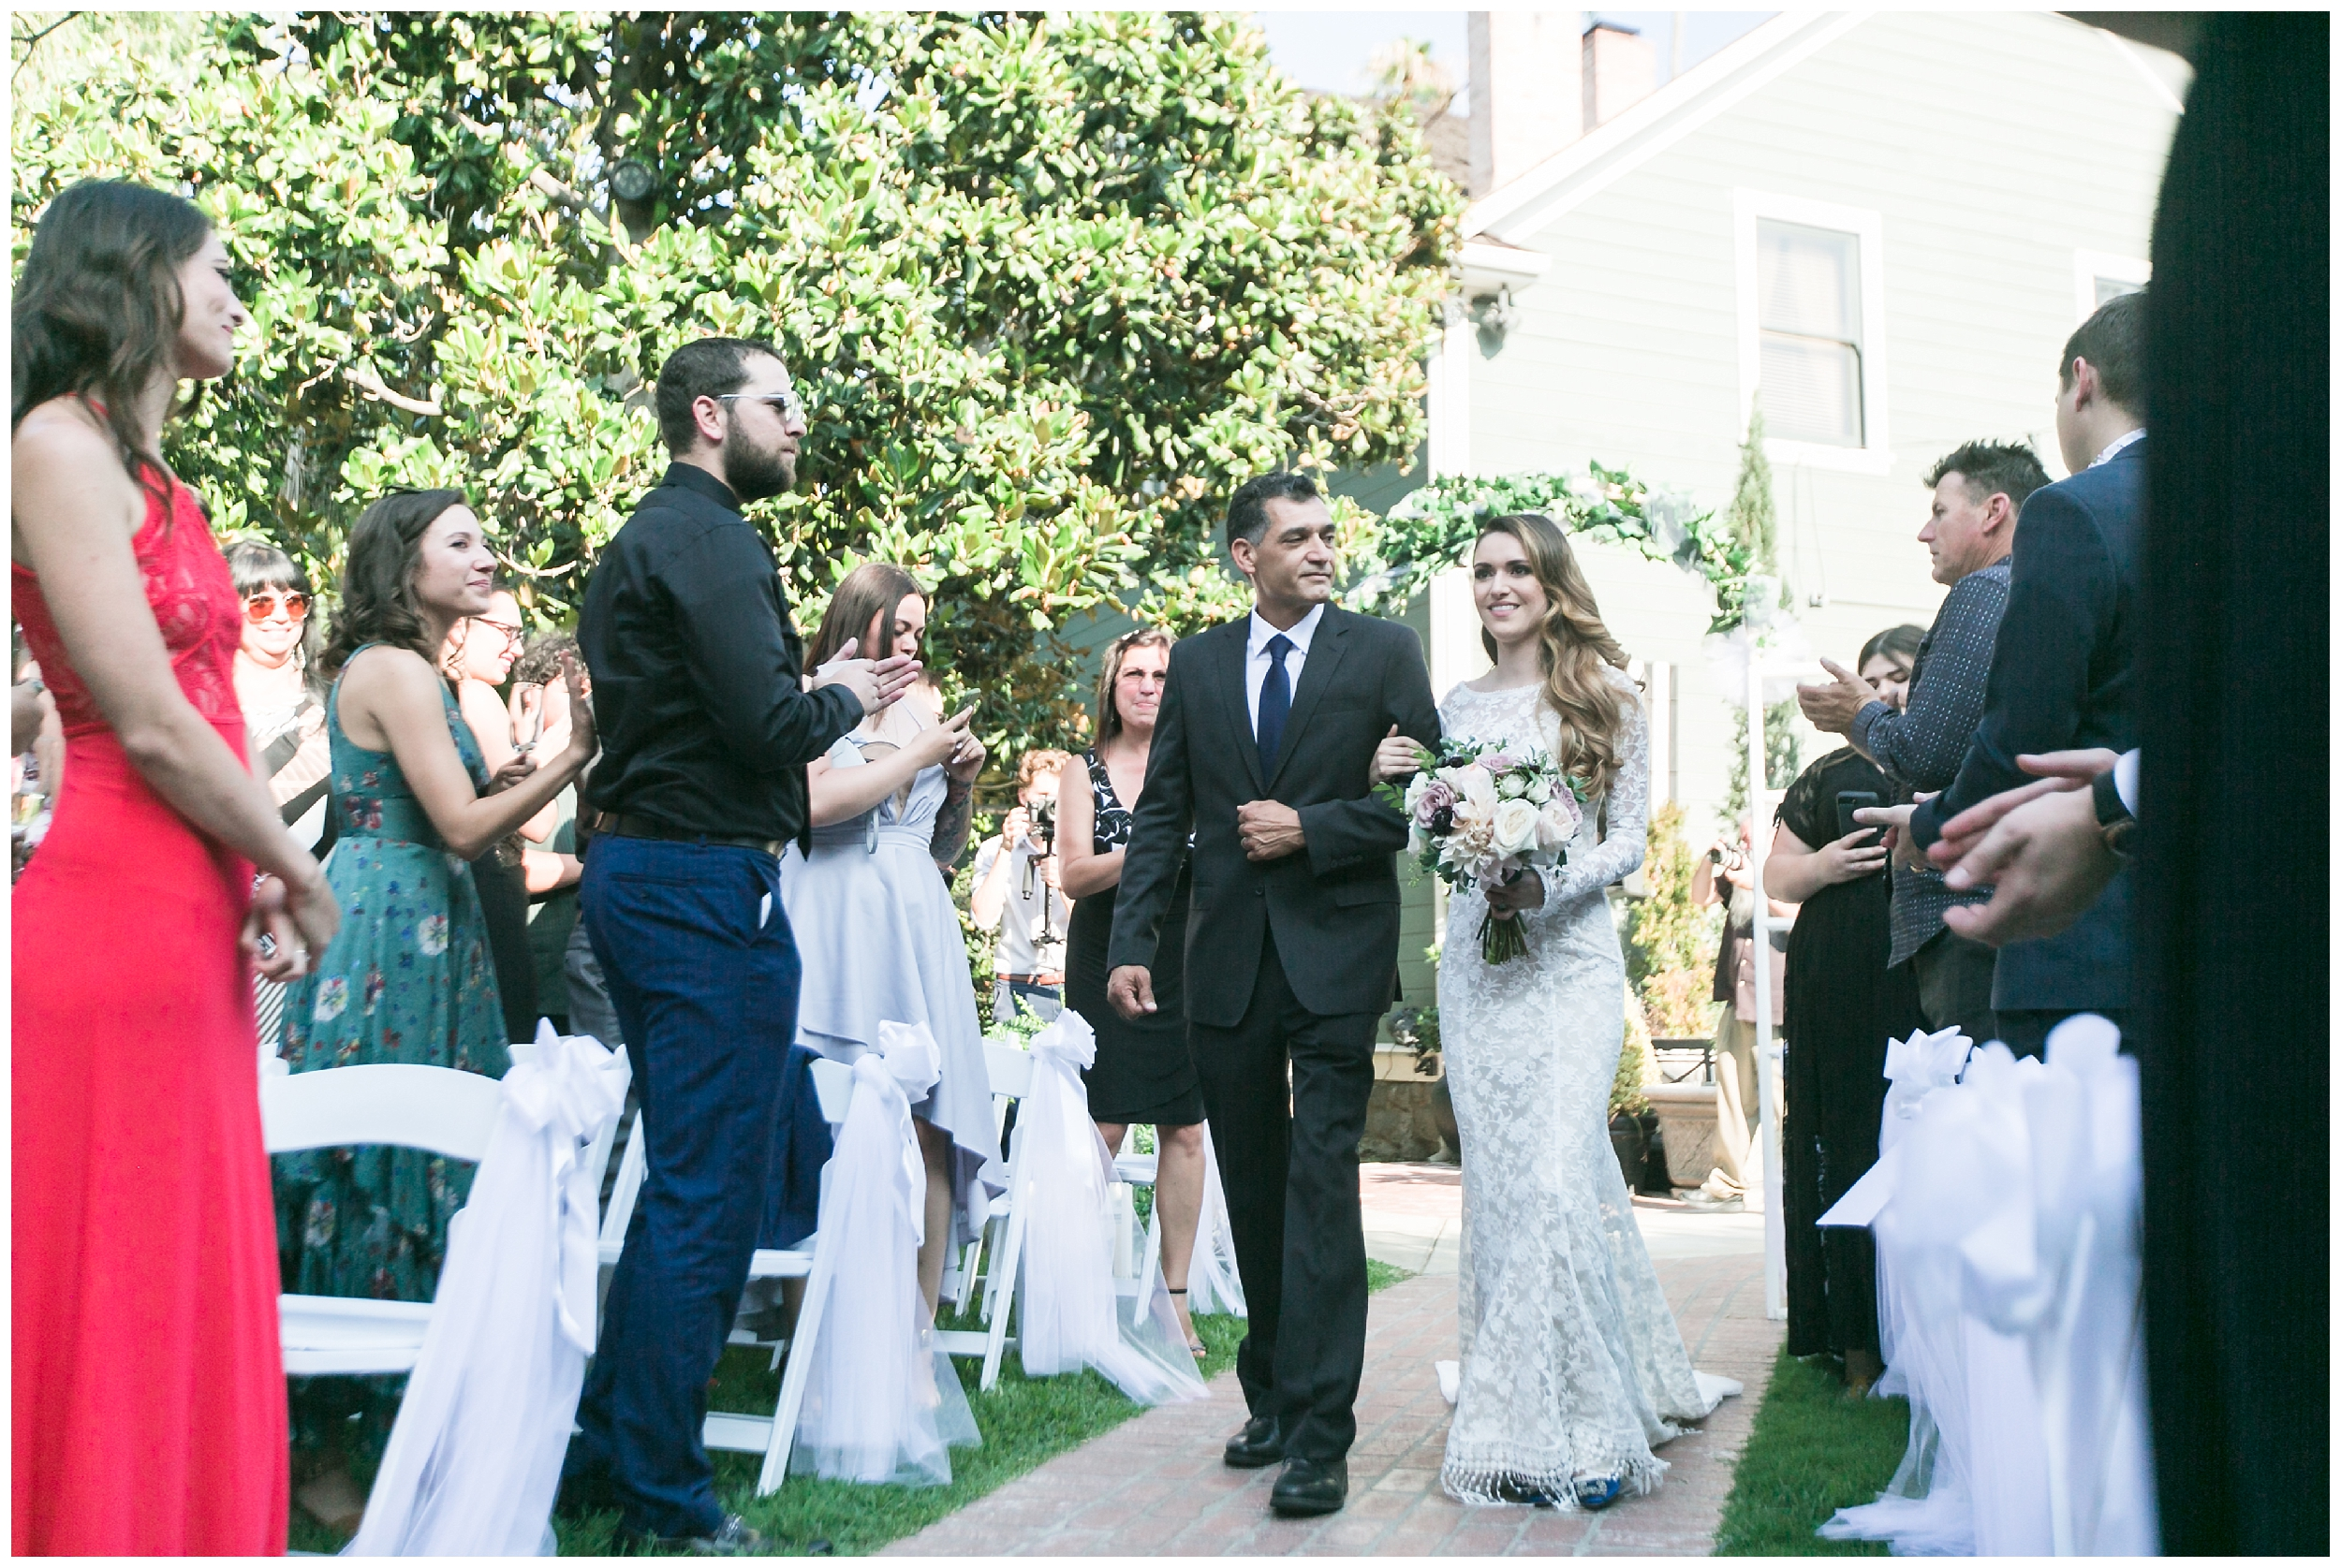 chic-christmas-house-wedding-ceremony-carrie-vines-007.jpg